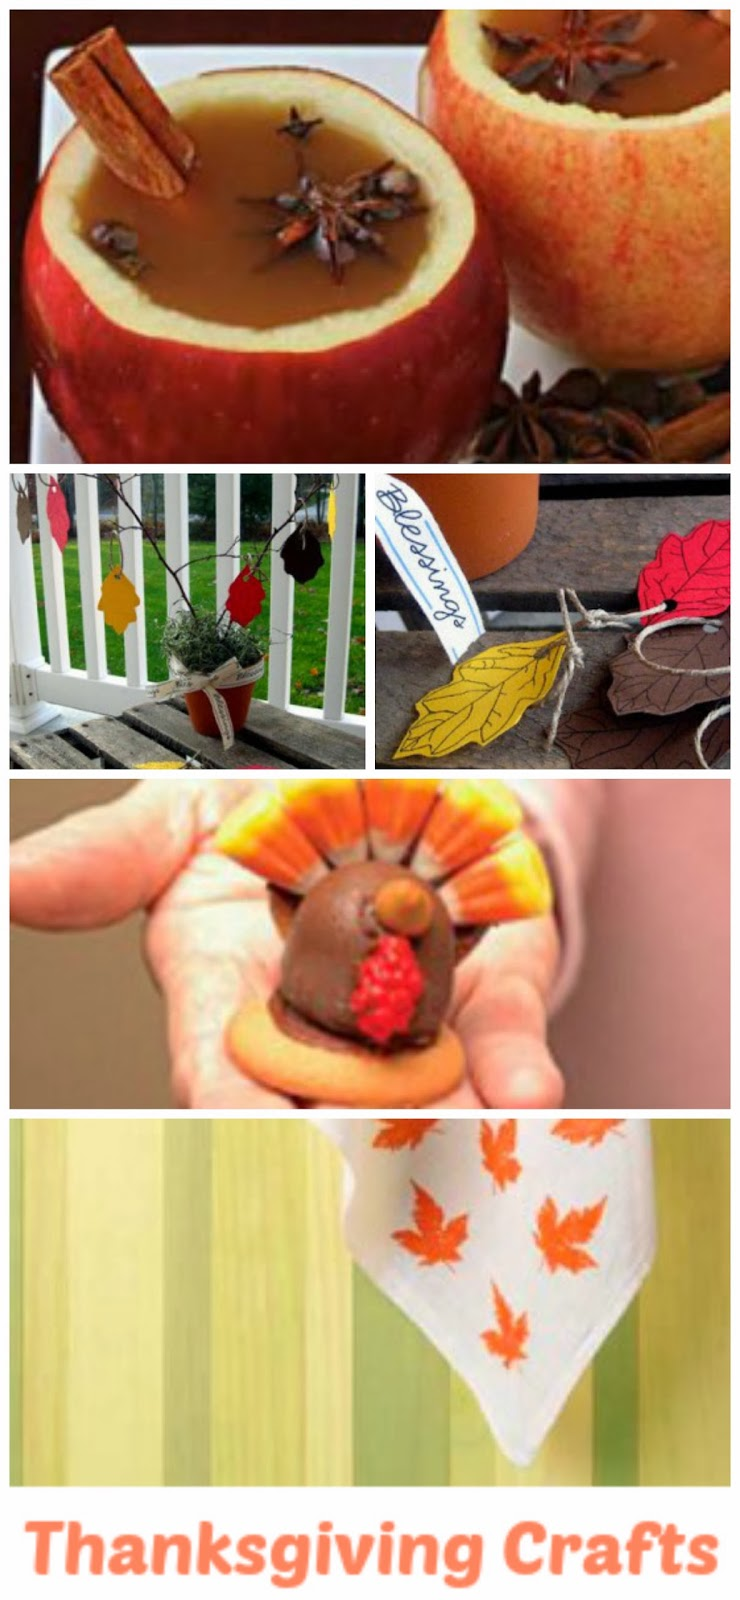 Thanksgiving craft ideas a sparkle of genius for Thanksgiving craft ideas pinterest